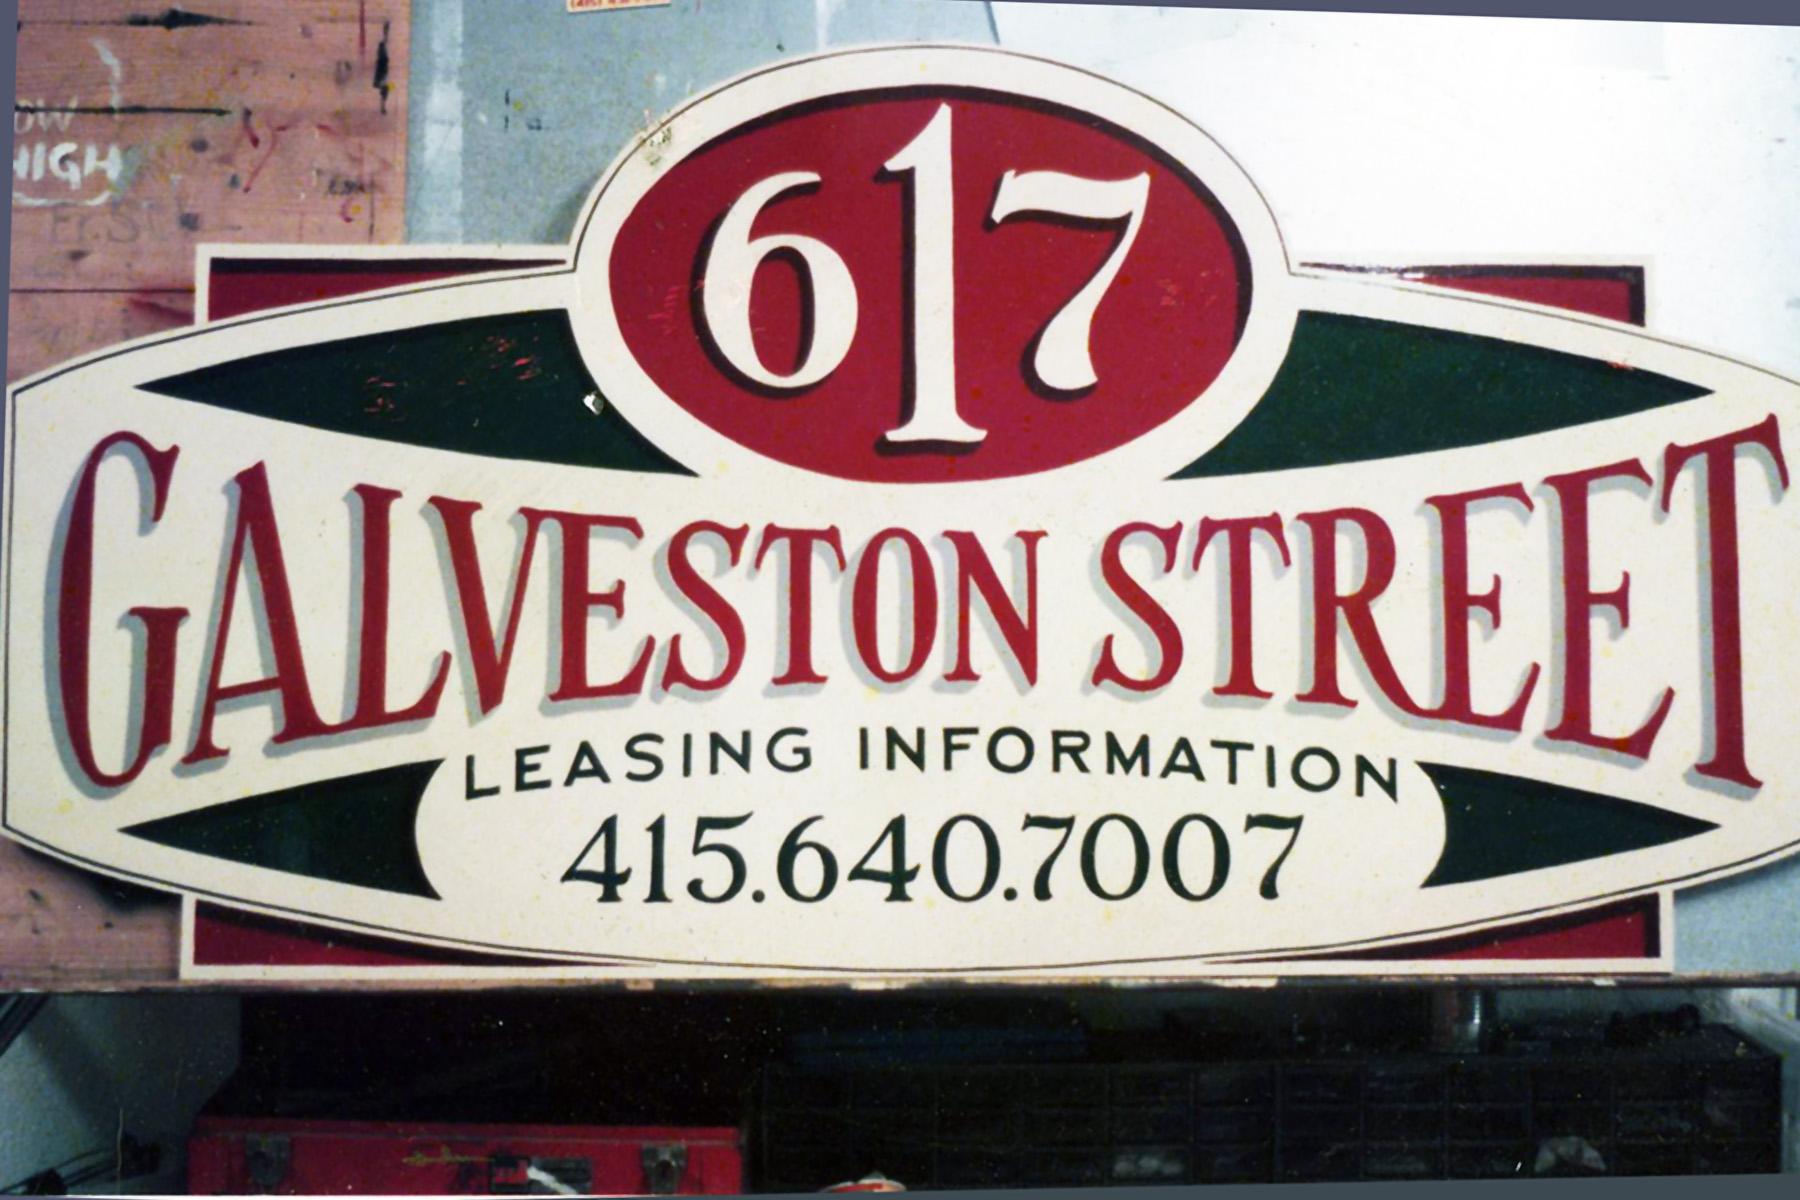 HAND-galvinson-street_5958656835_o.jpg